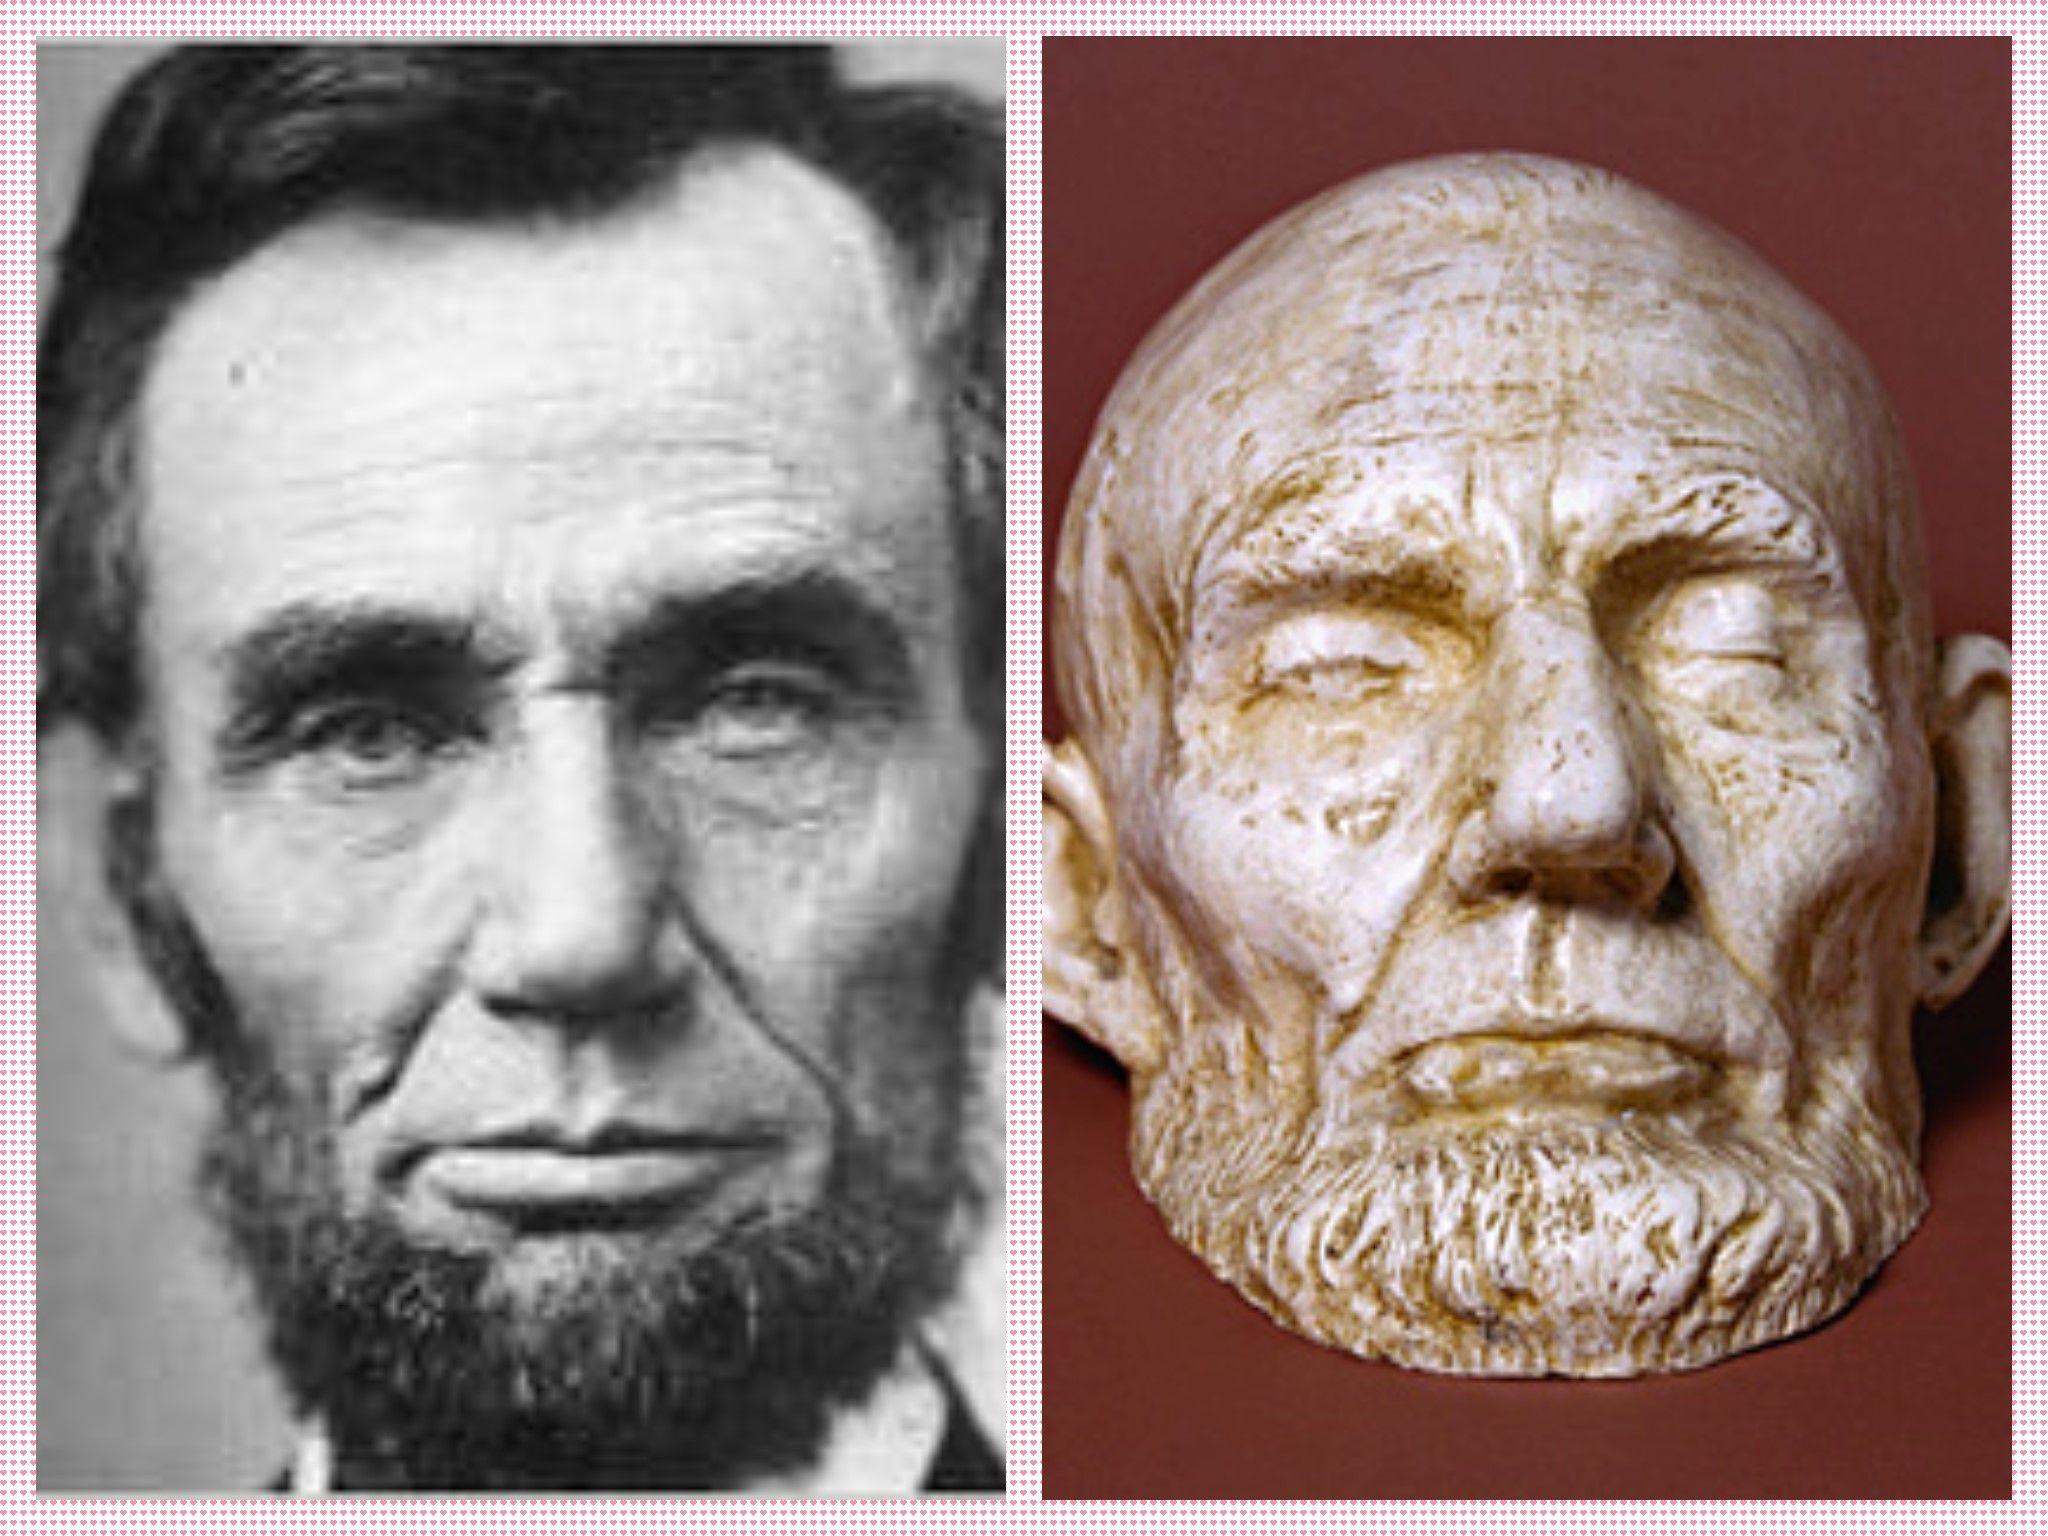 Abraham Lincoln Listeni ˈeɪbrəhaem ˈlɪŋkən February 12 1809